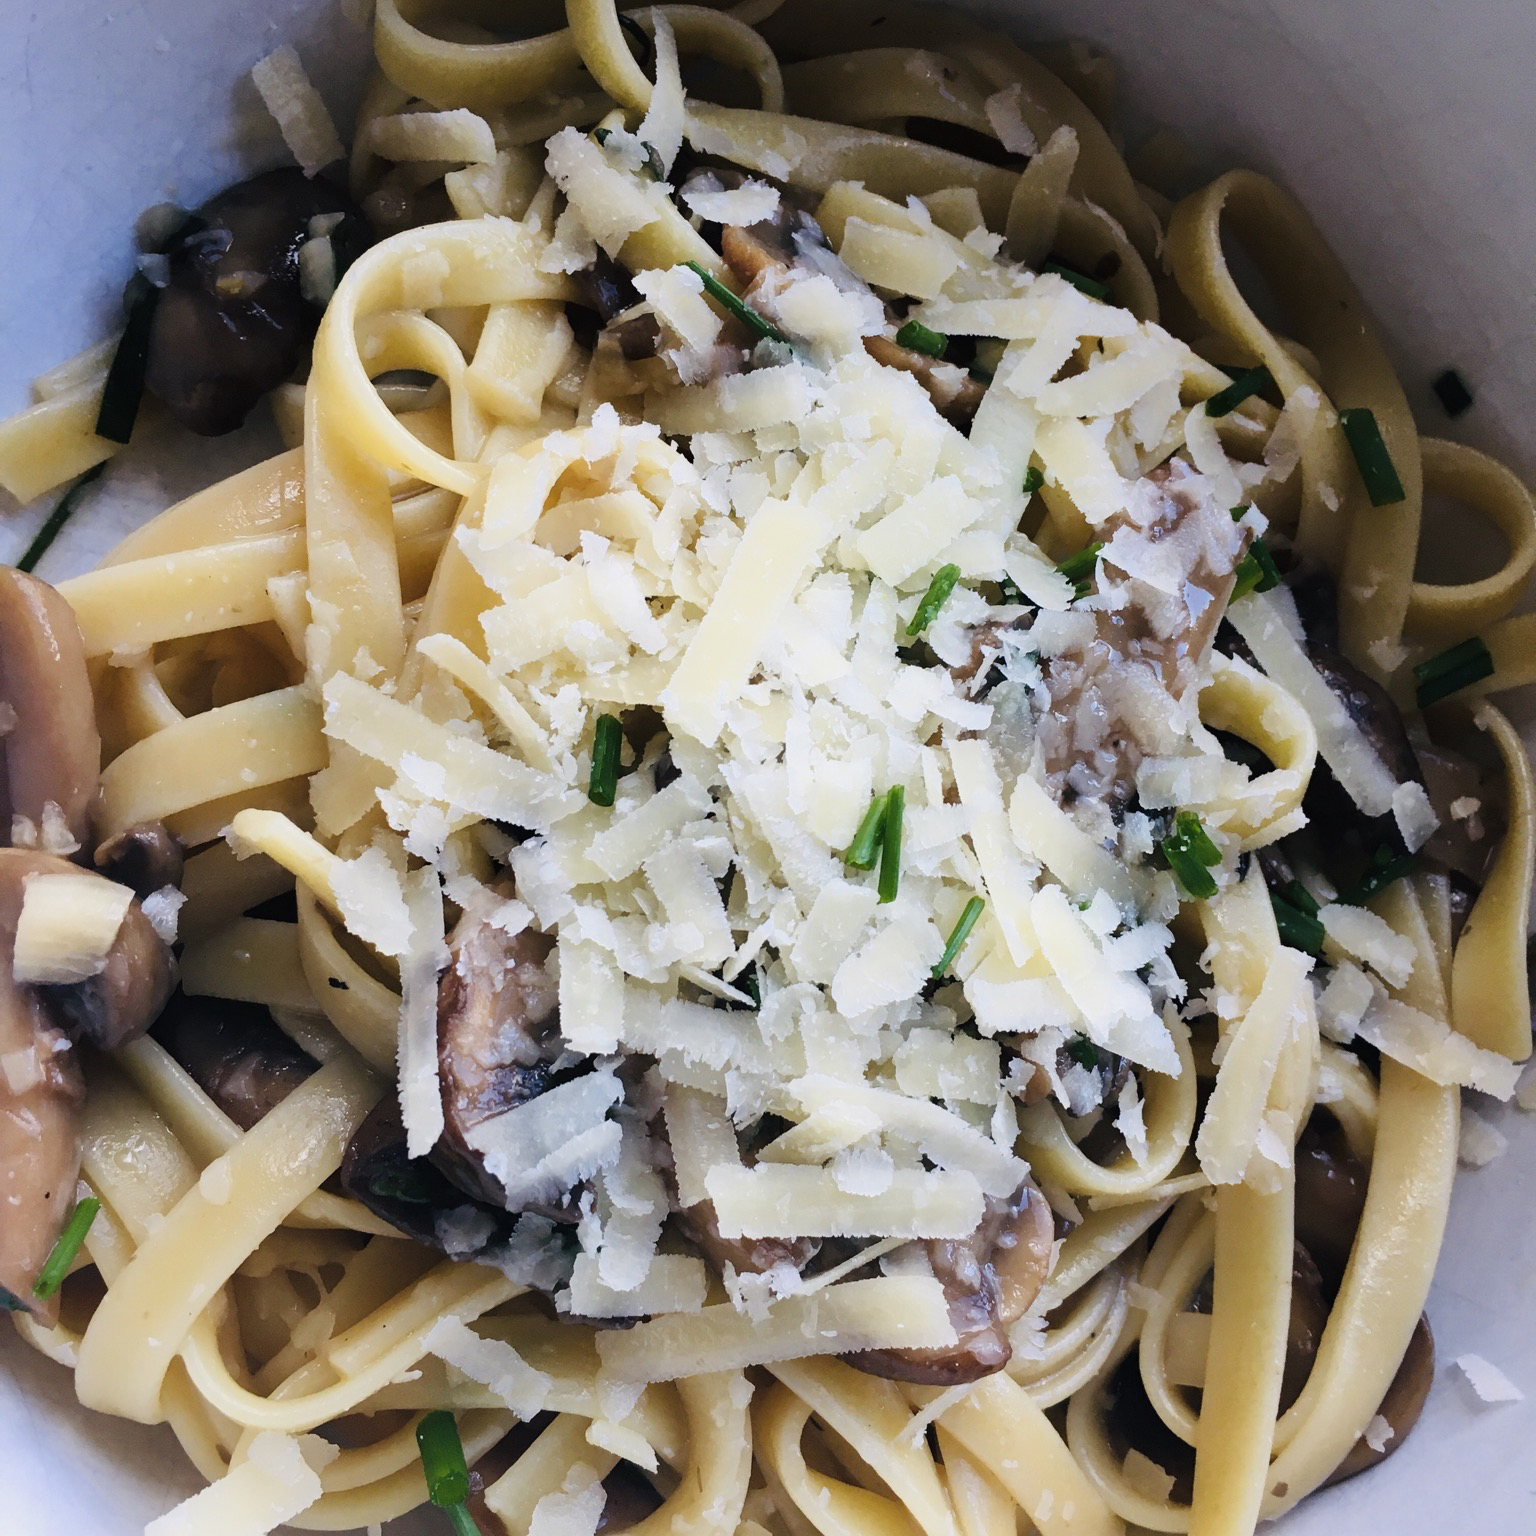 Chef John's Creamy Mushroom Pasta